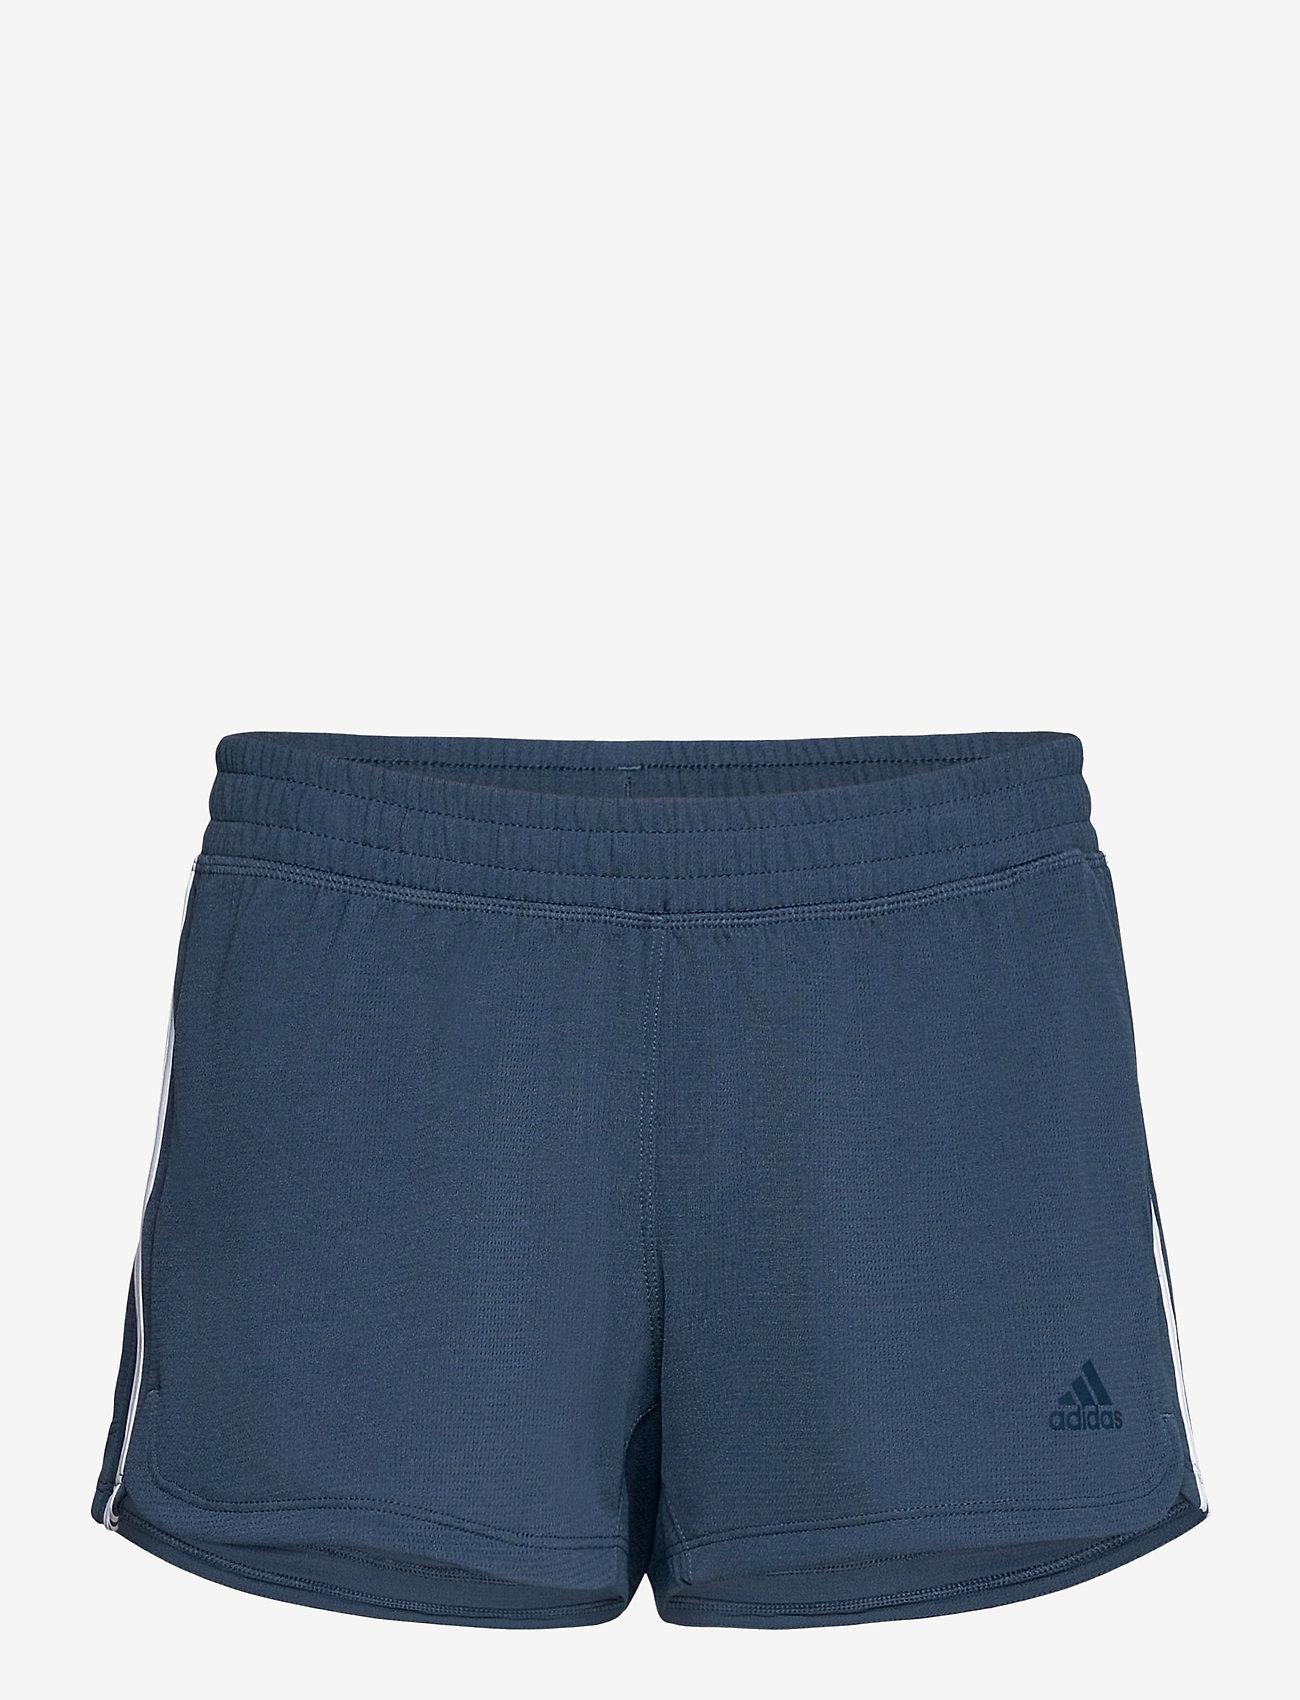 adidas Performance - Pacer 3-Stripes Knit Shorts W - training korte broek - crenav/white - 1